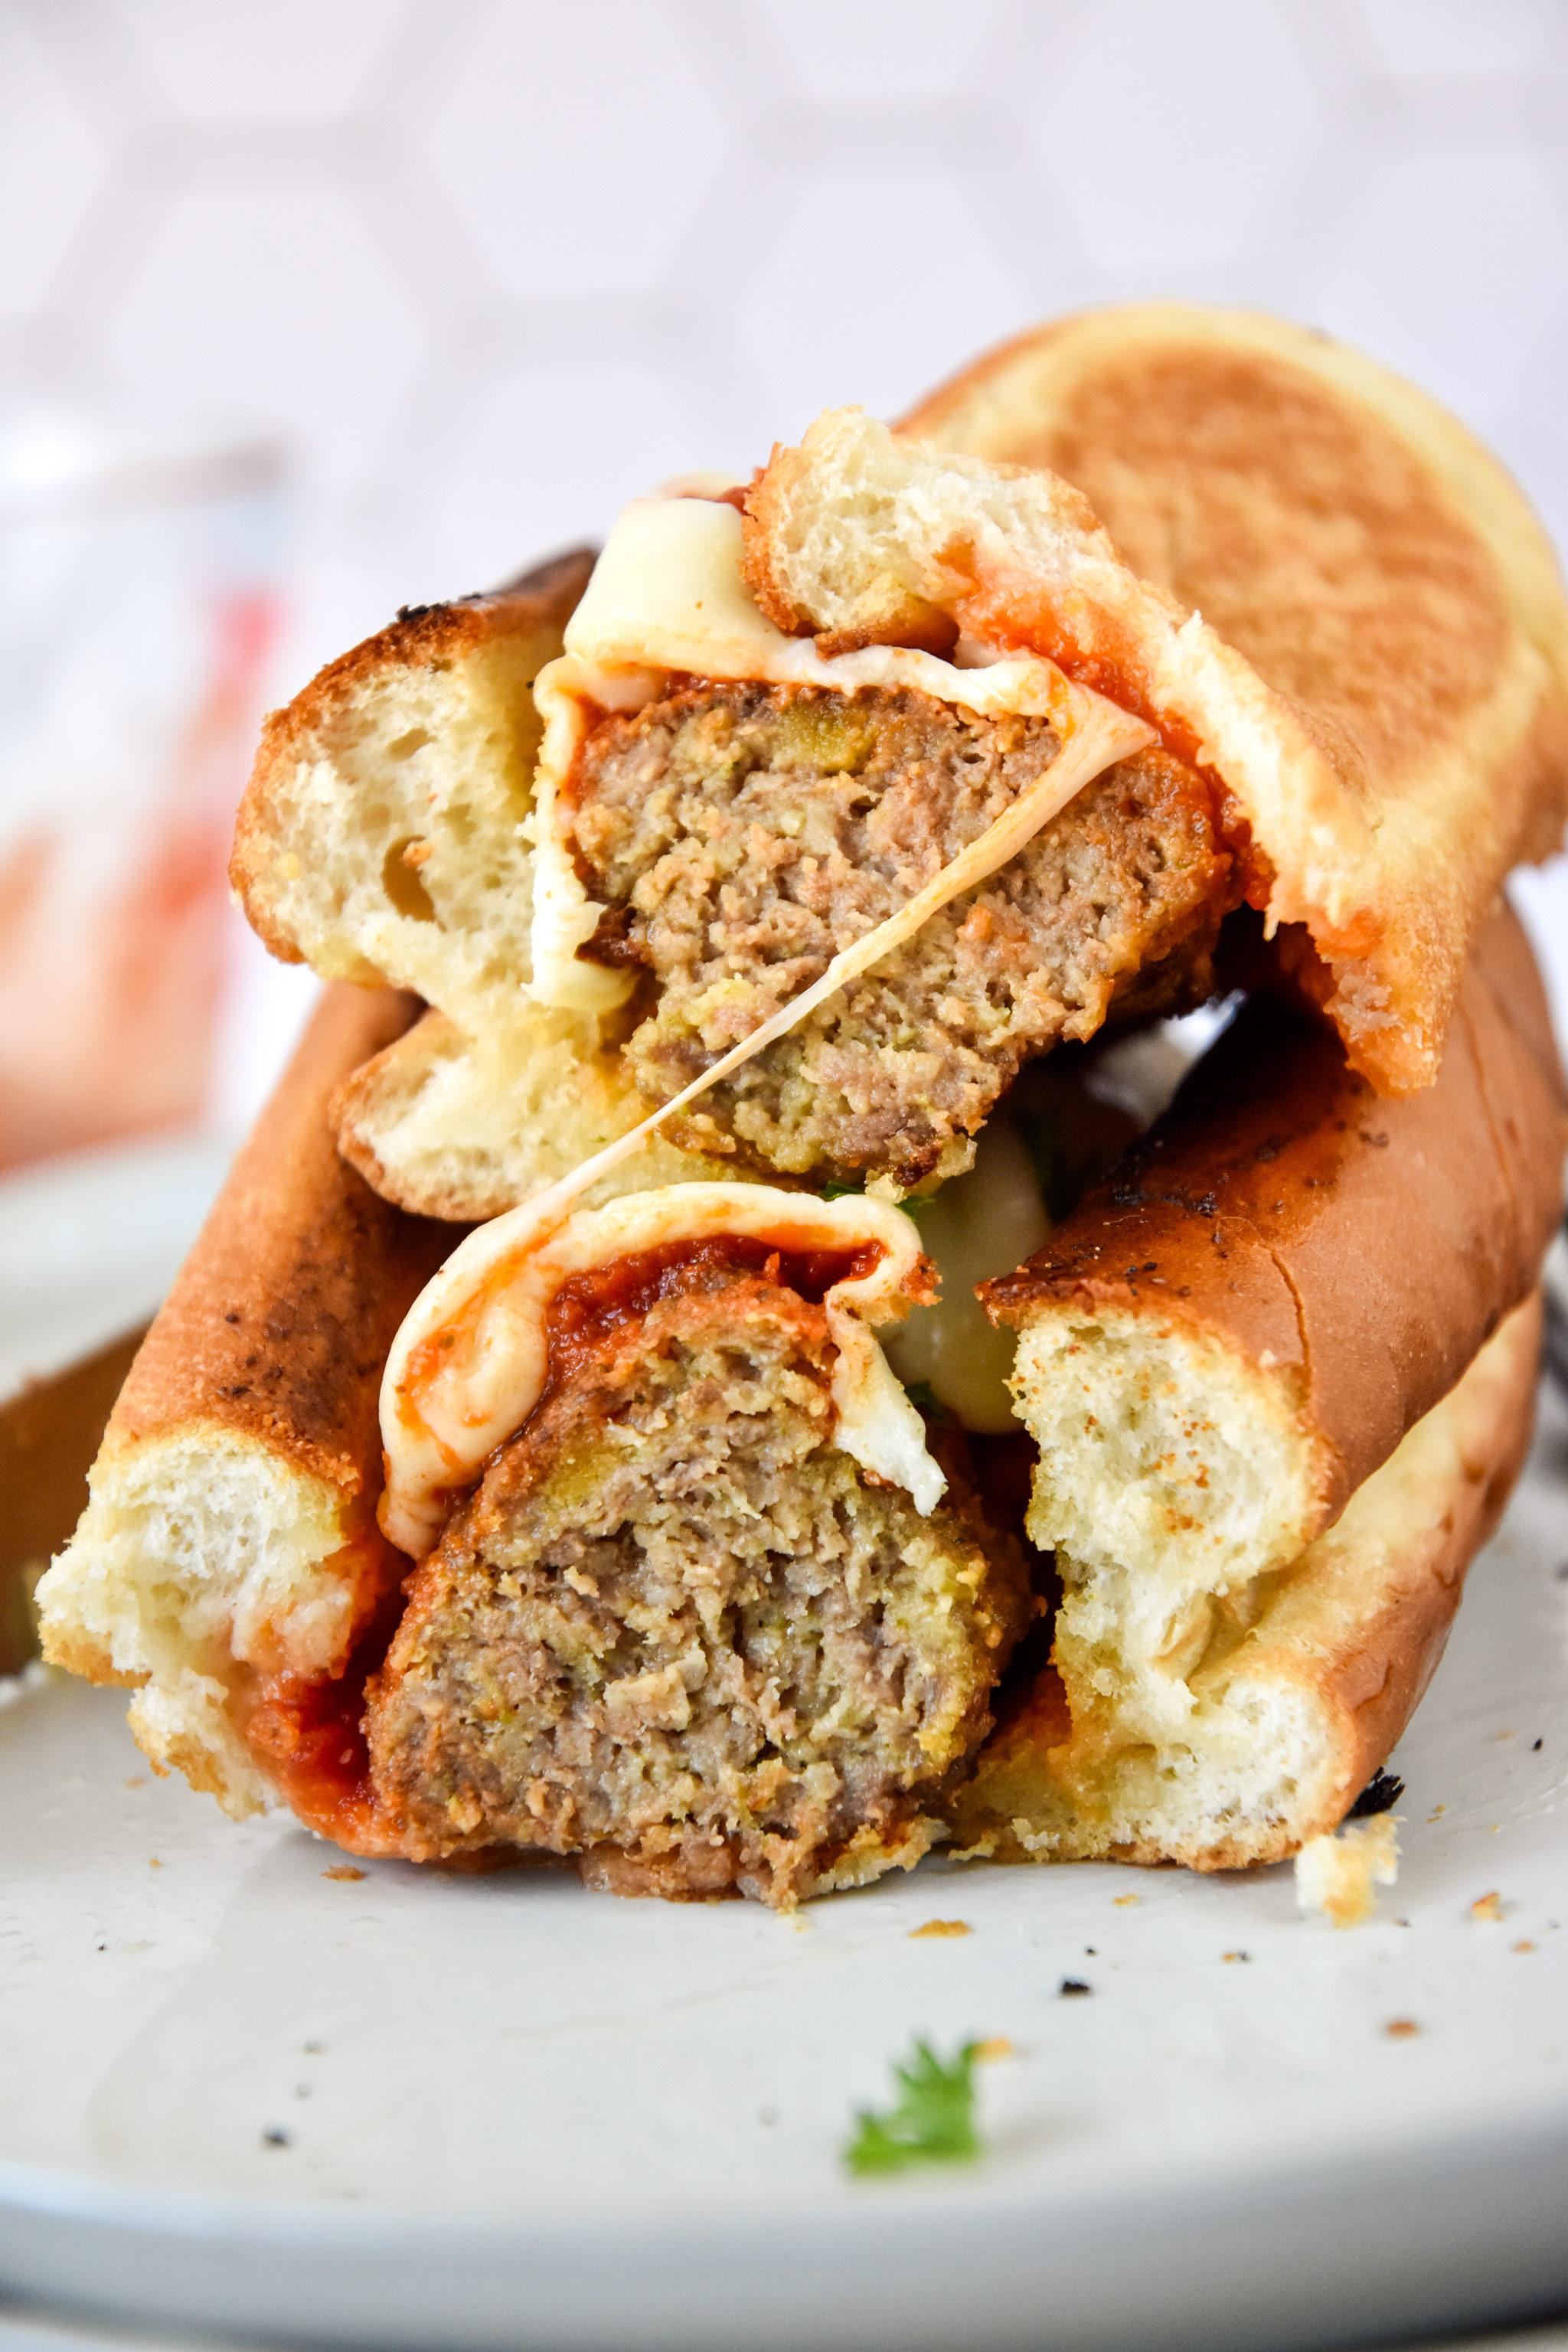 meatball sub sandwich with melty mozzarella cheese.